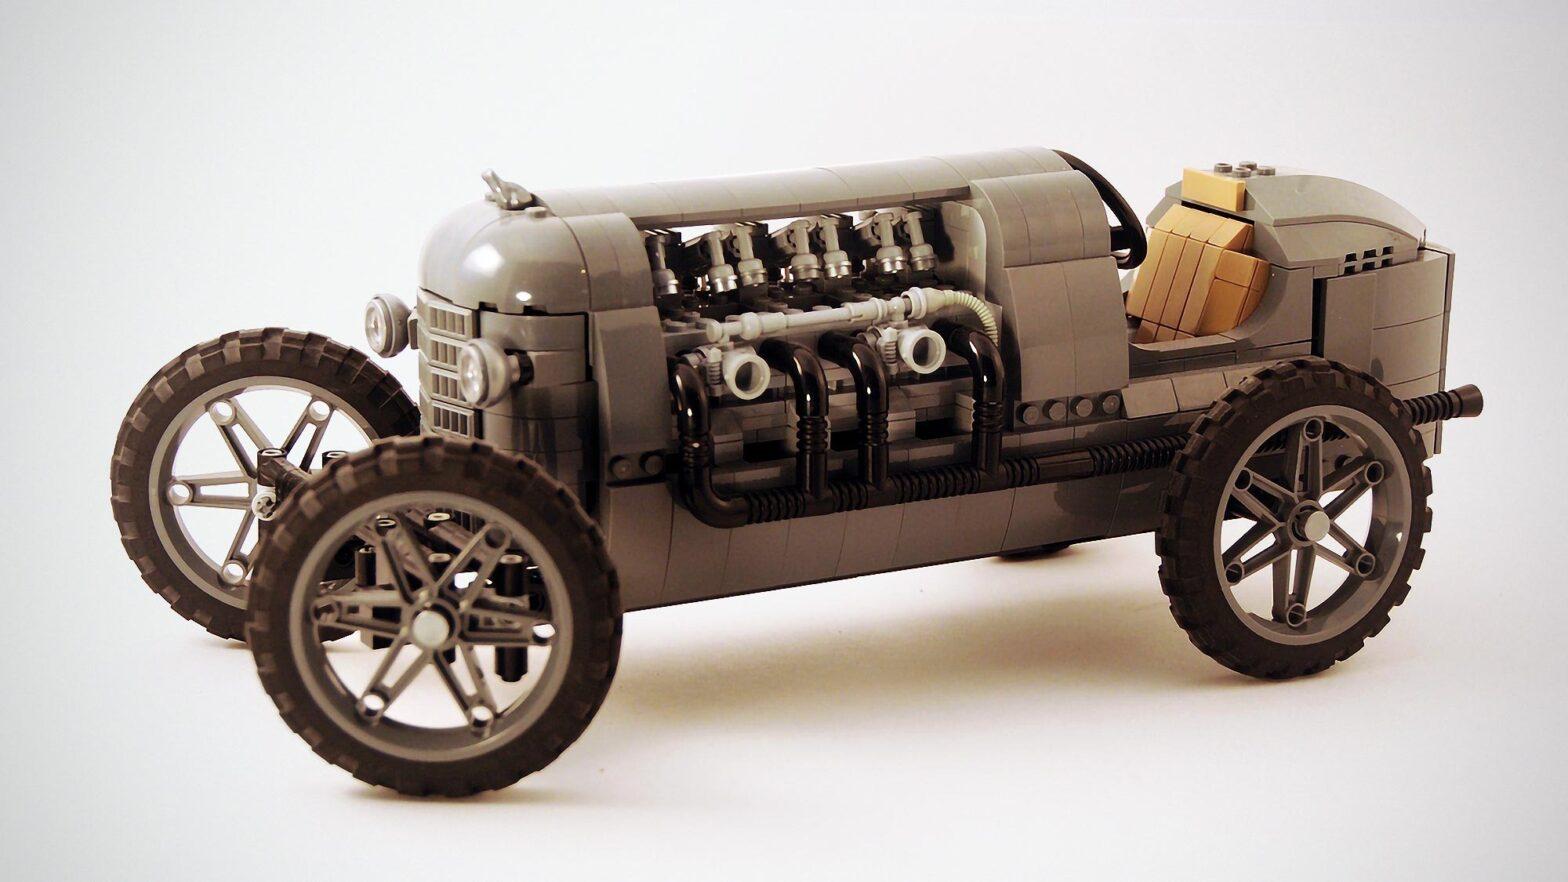 LEGO MOC Early 1900s Race Car